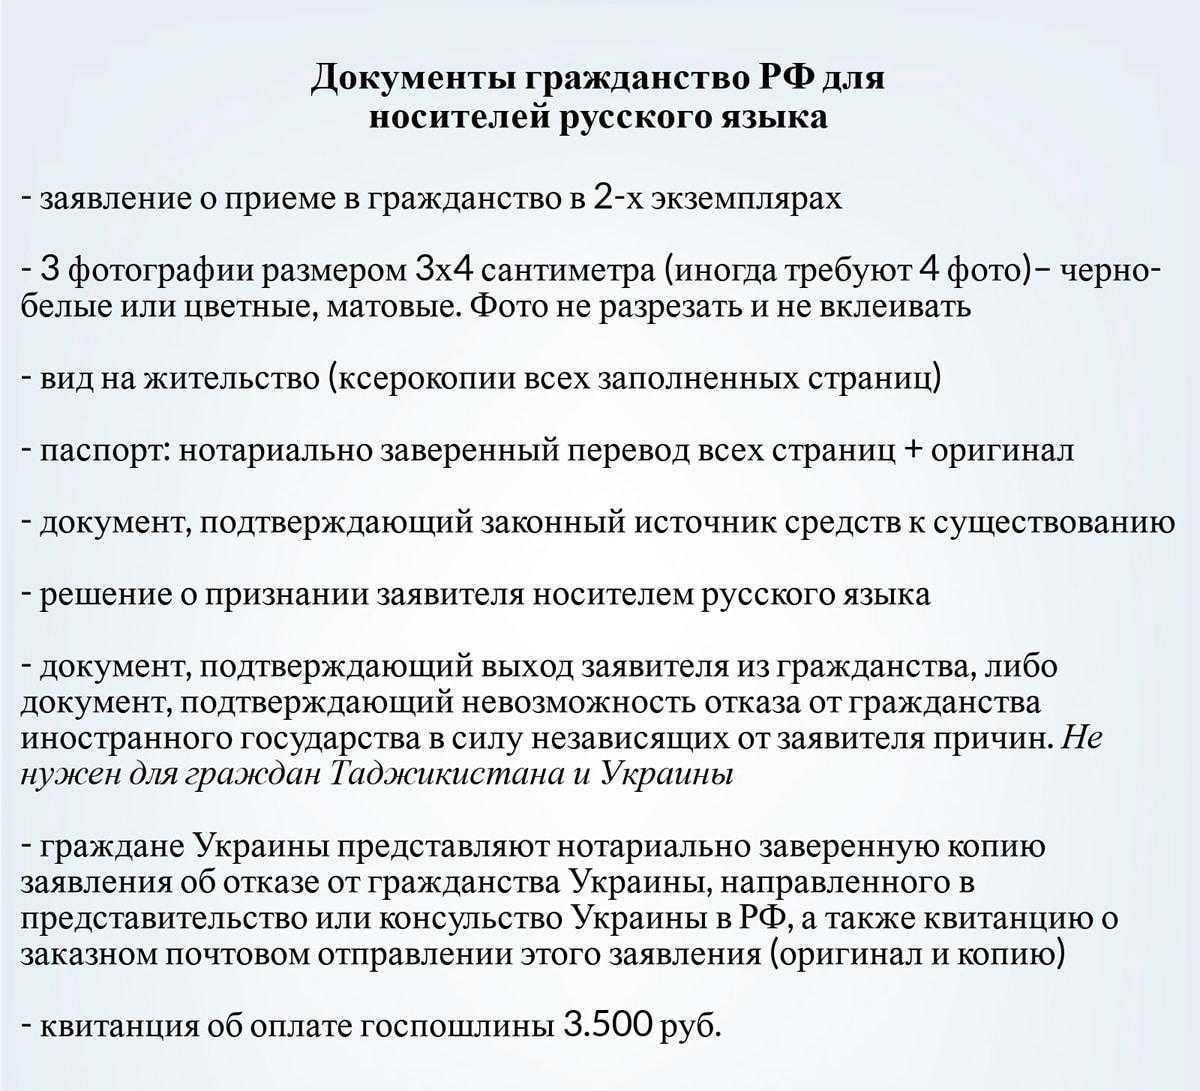 Комментарий к статье 17.14 КоАП РФ